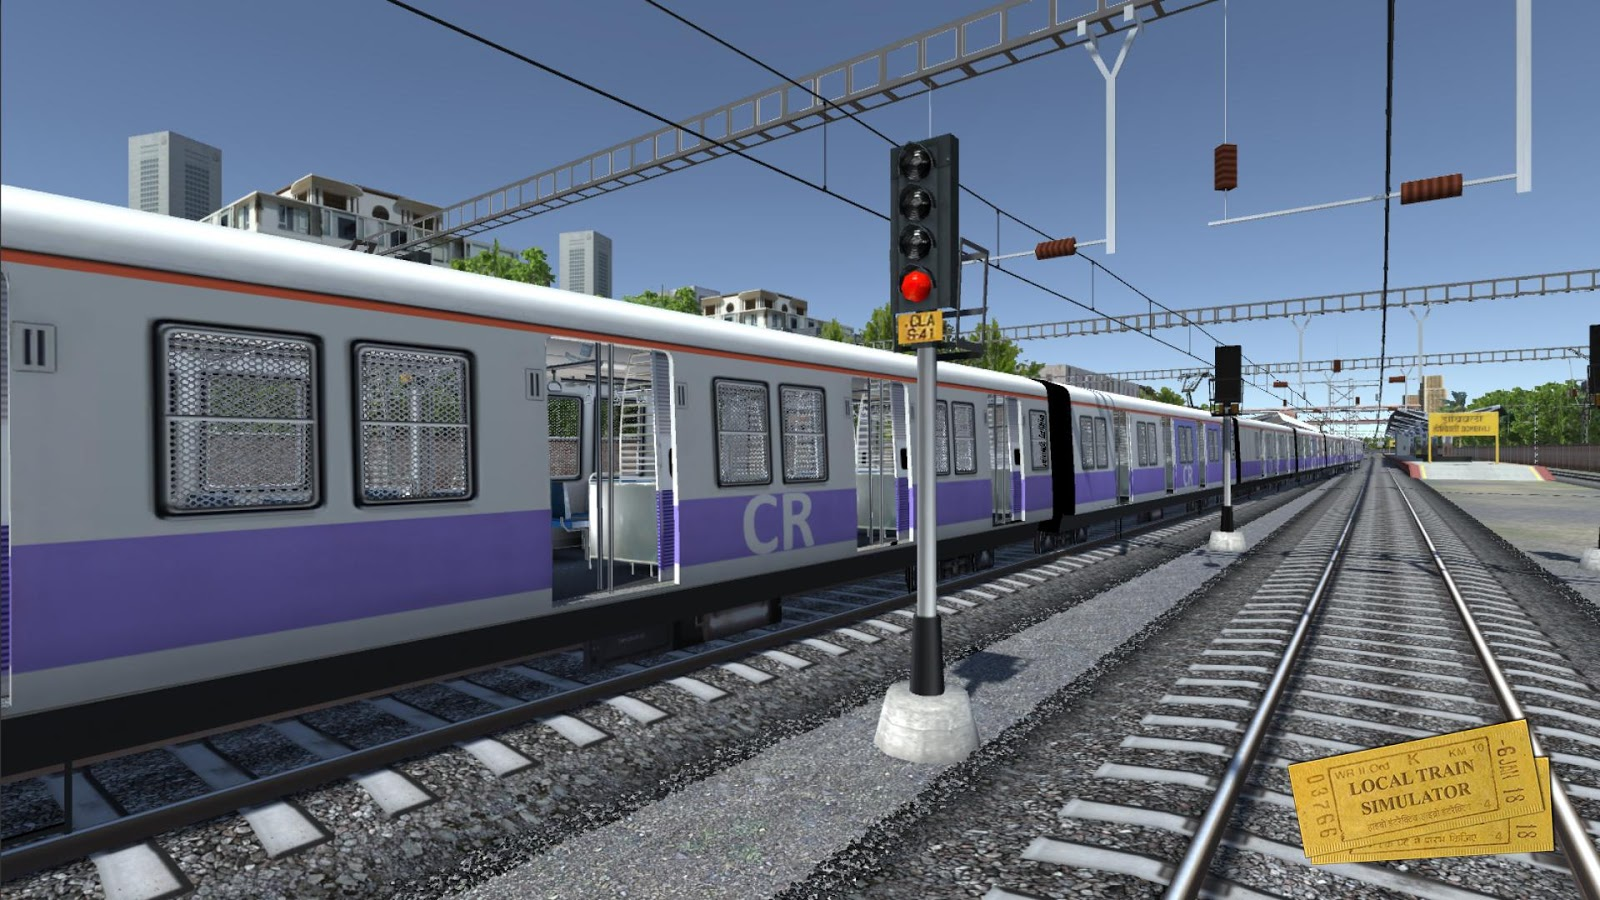 train simulator 2017 mod apk free download